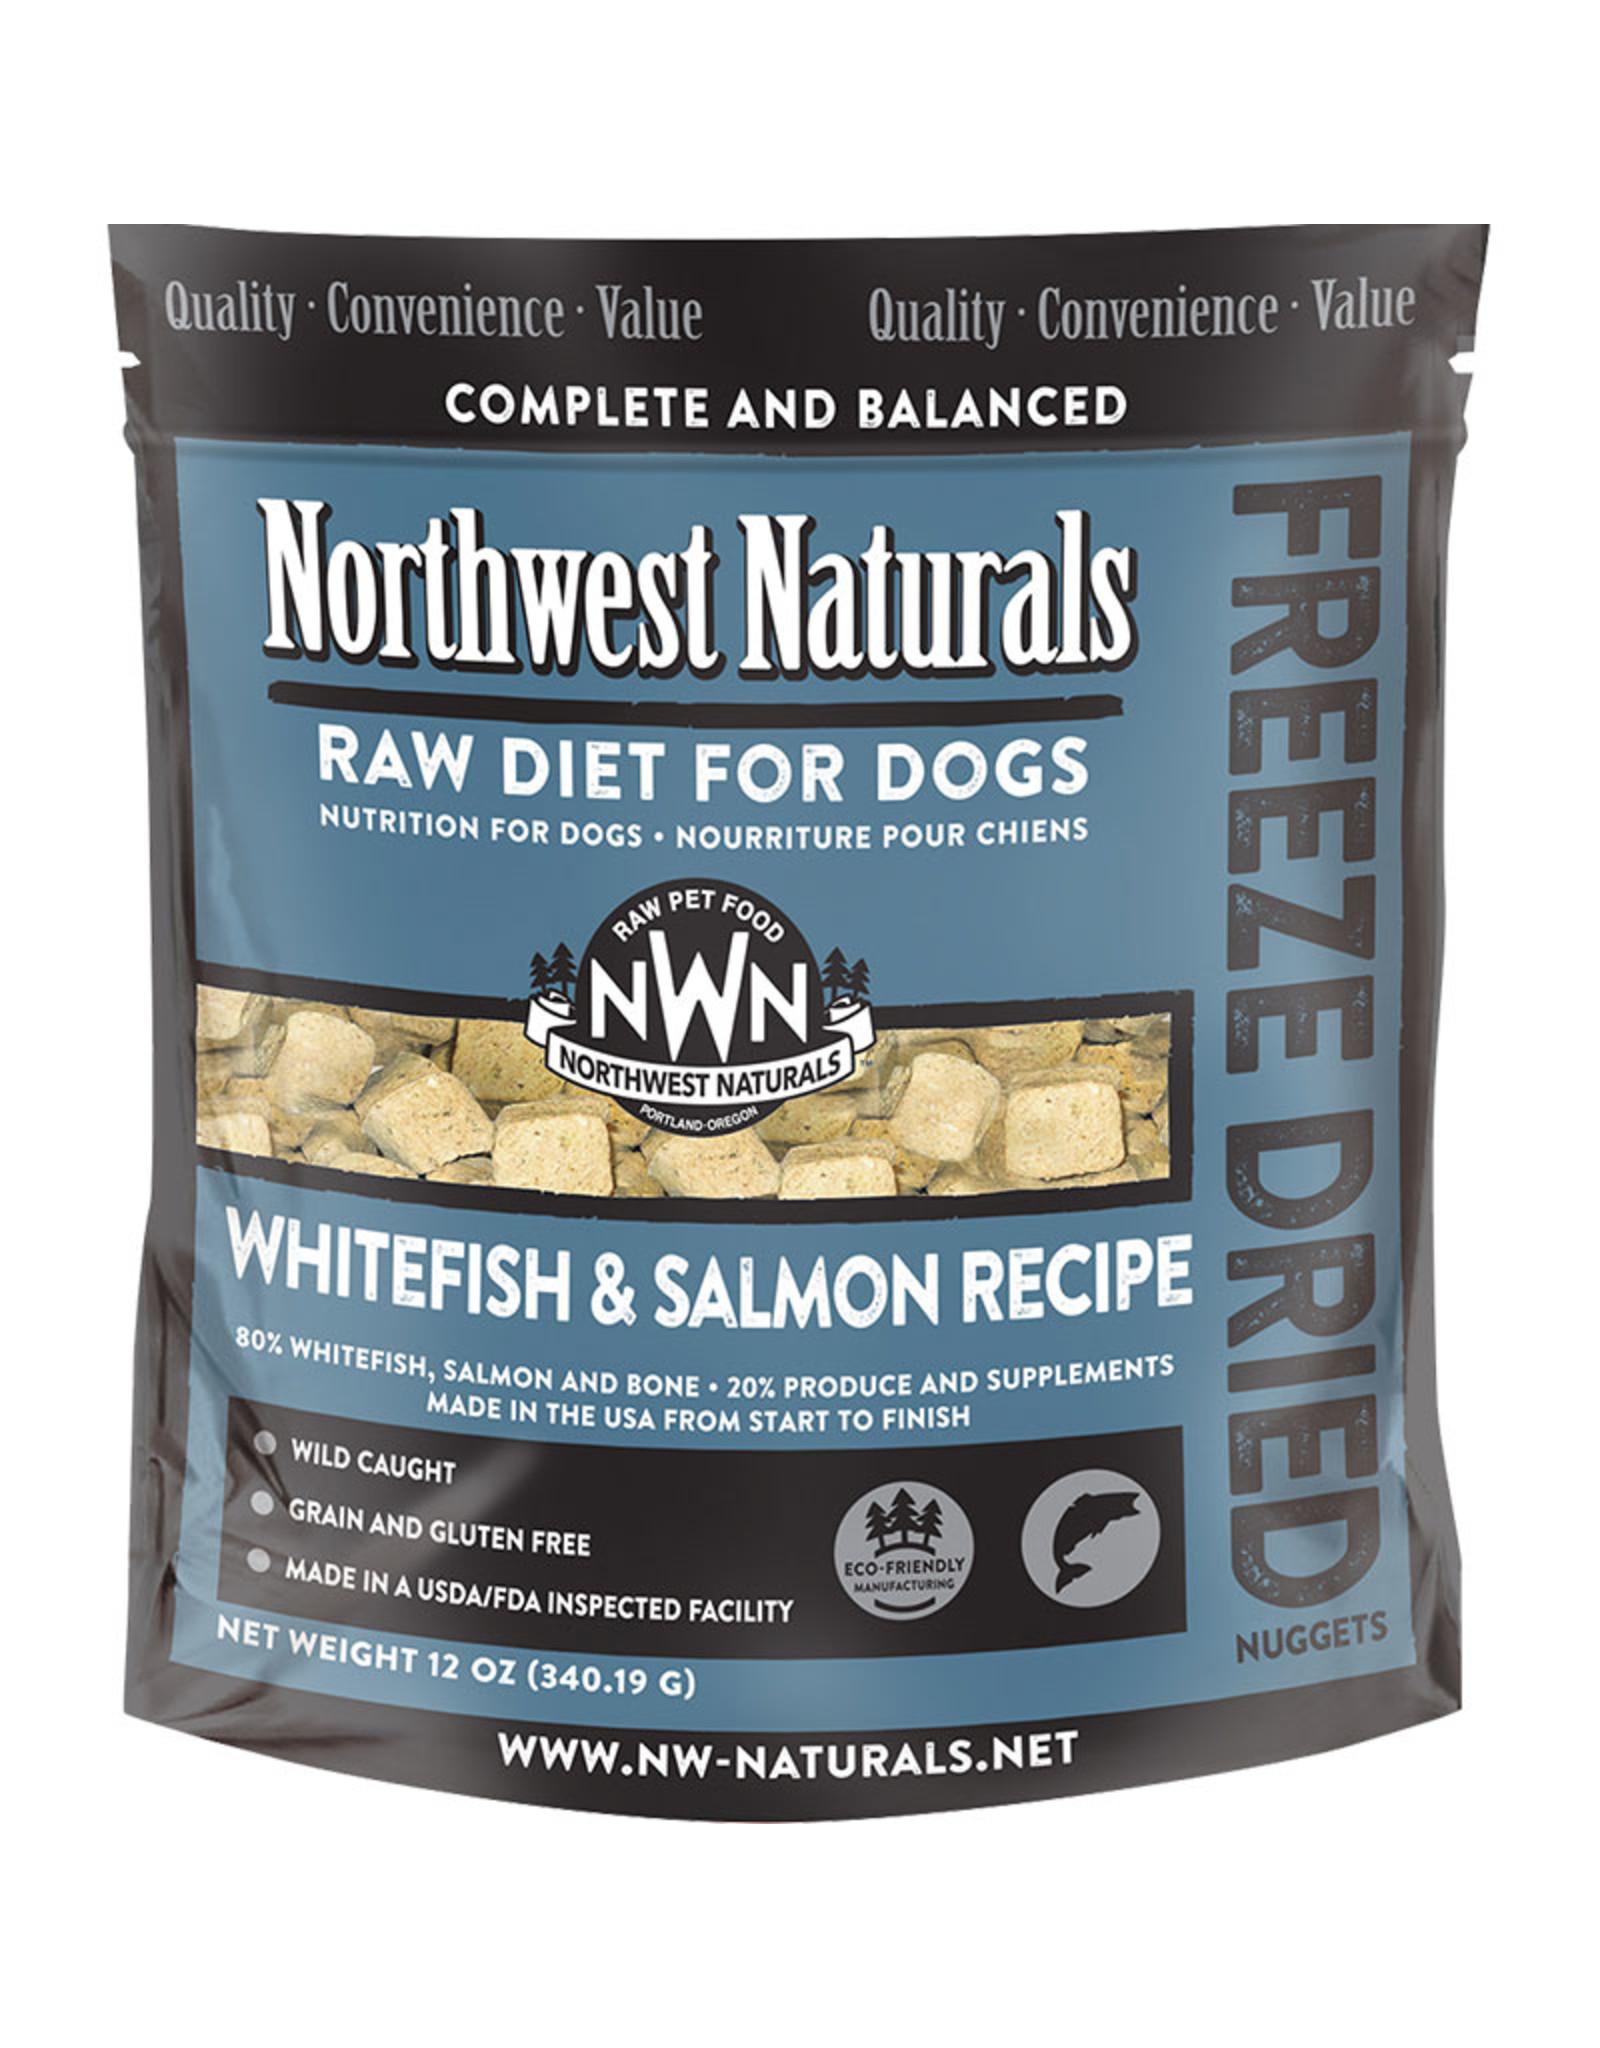 Northwest Naturals Northwest Naturals Raw Diet for Dogs Freeze Dried Nuggets Whitefish & Salmon Recipe 12oz